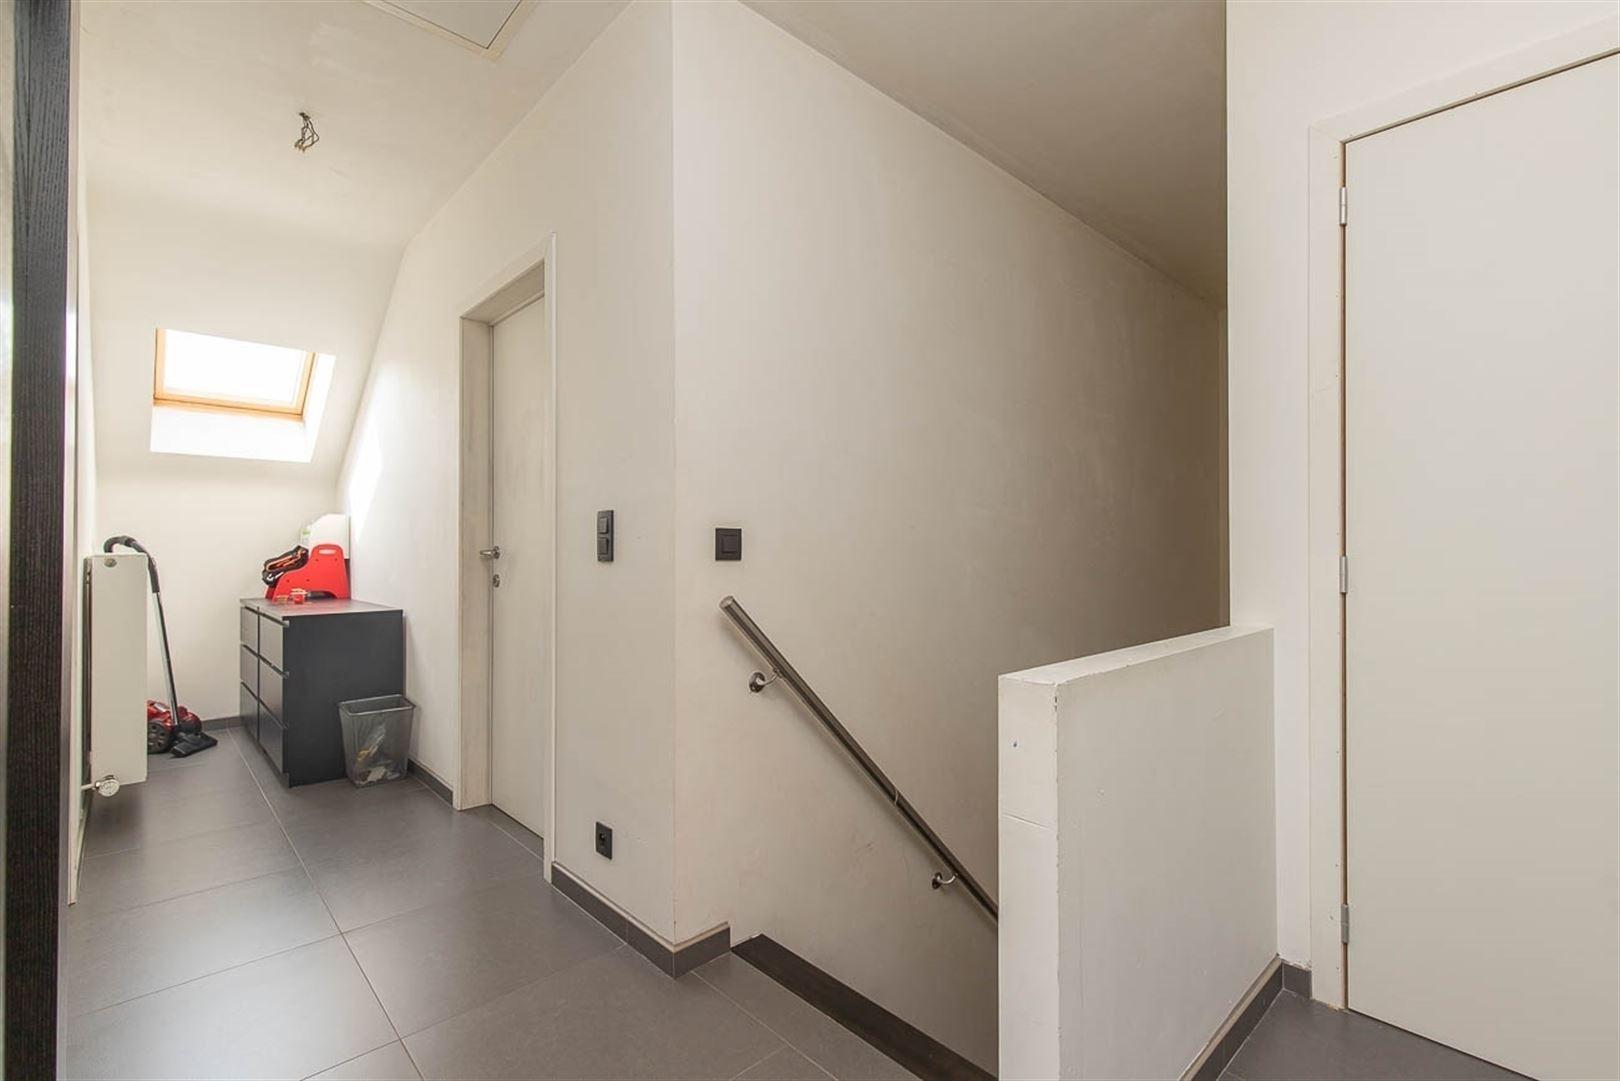 Foto 9 : Woning te 9220 MOERZEKE (België) - Prijs € 399.000